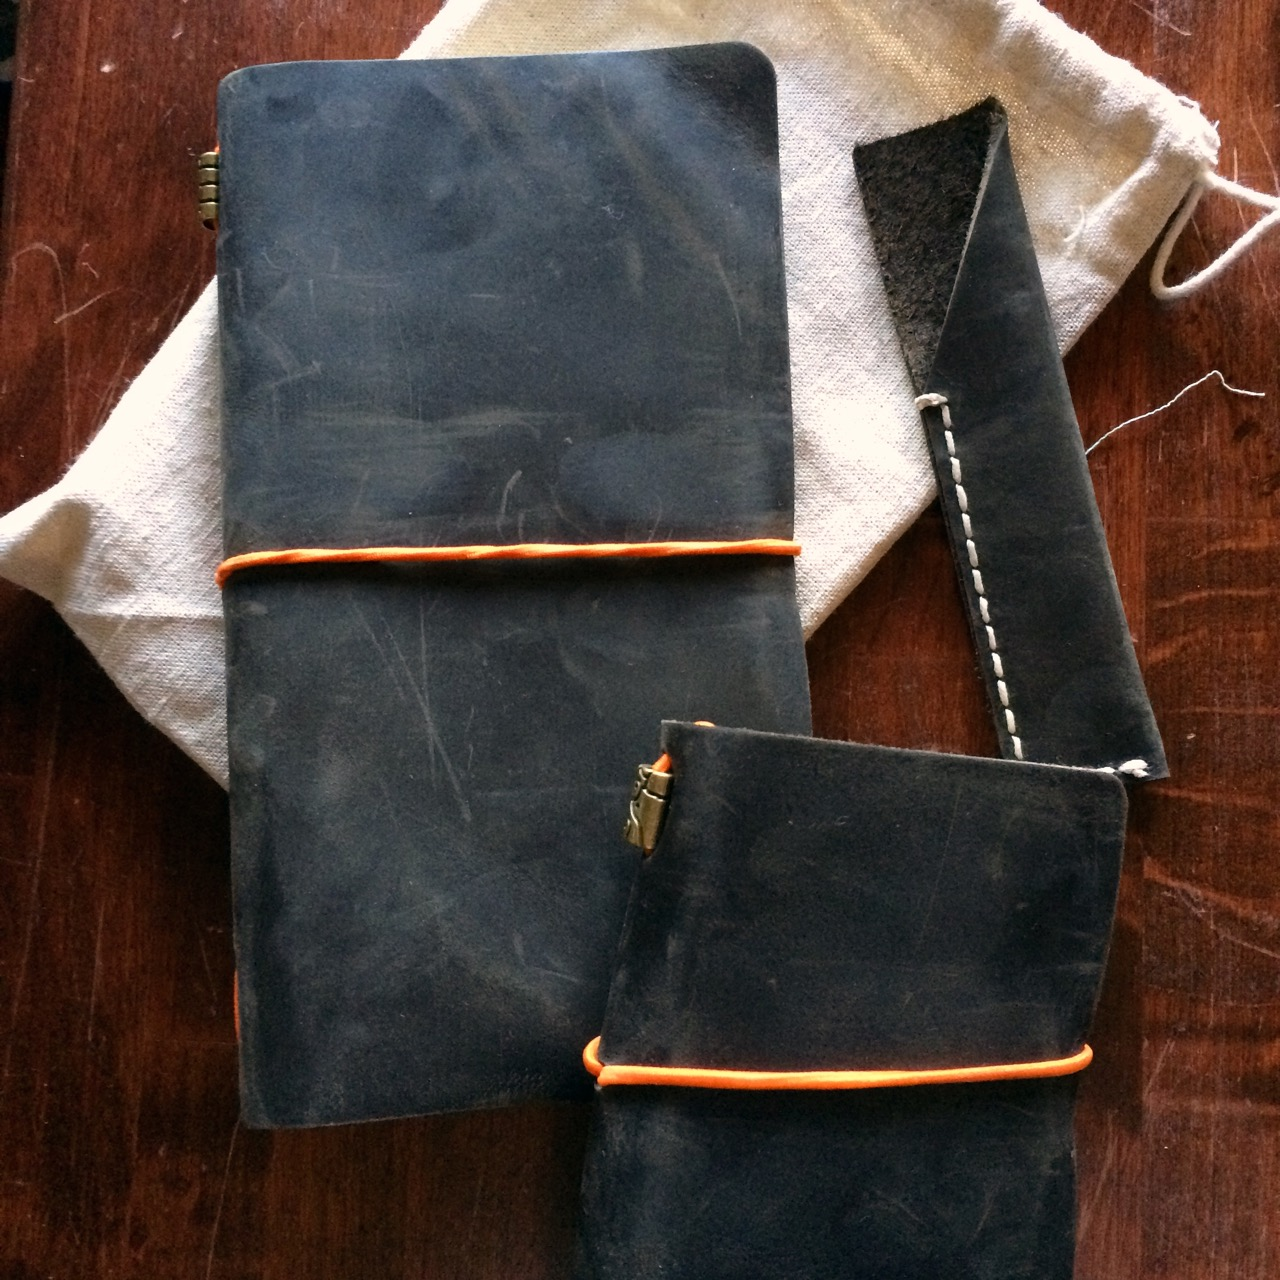 One Traveler's size journal, one Passport journal, one pen case.